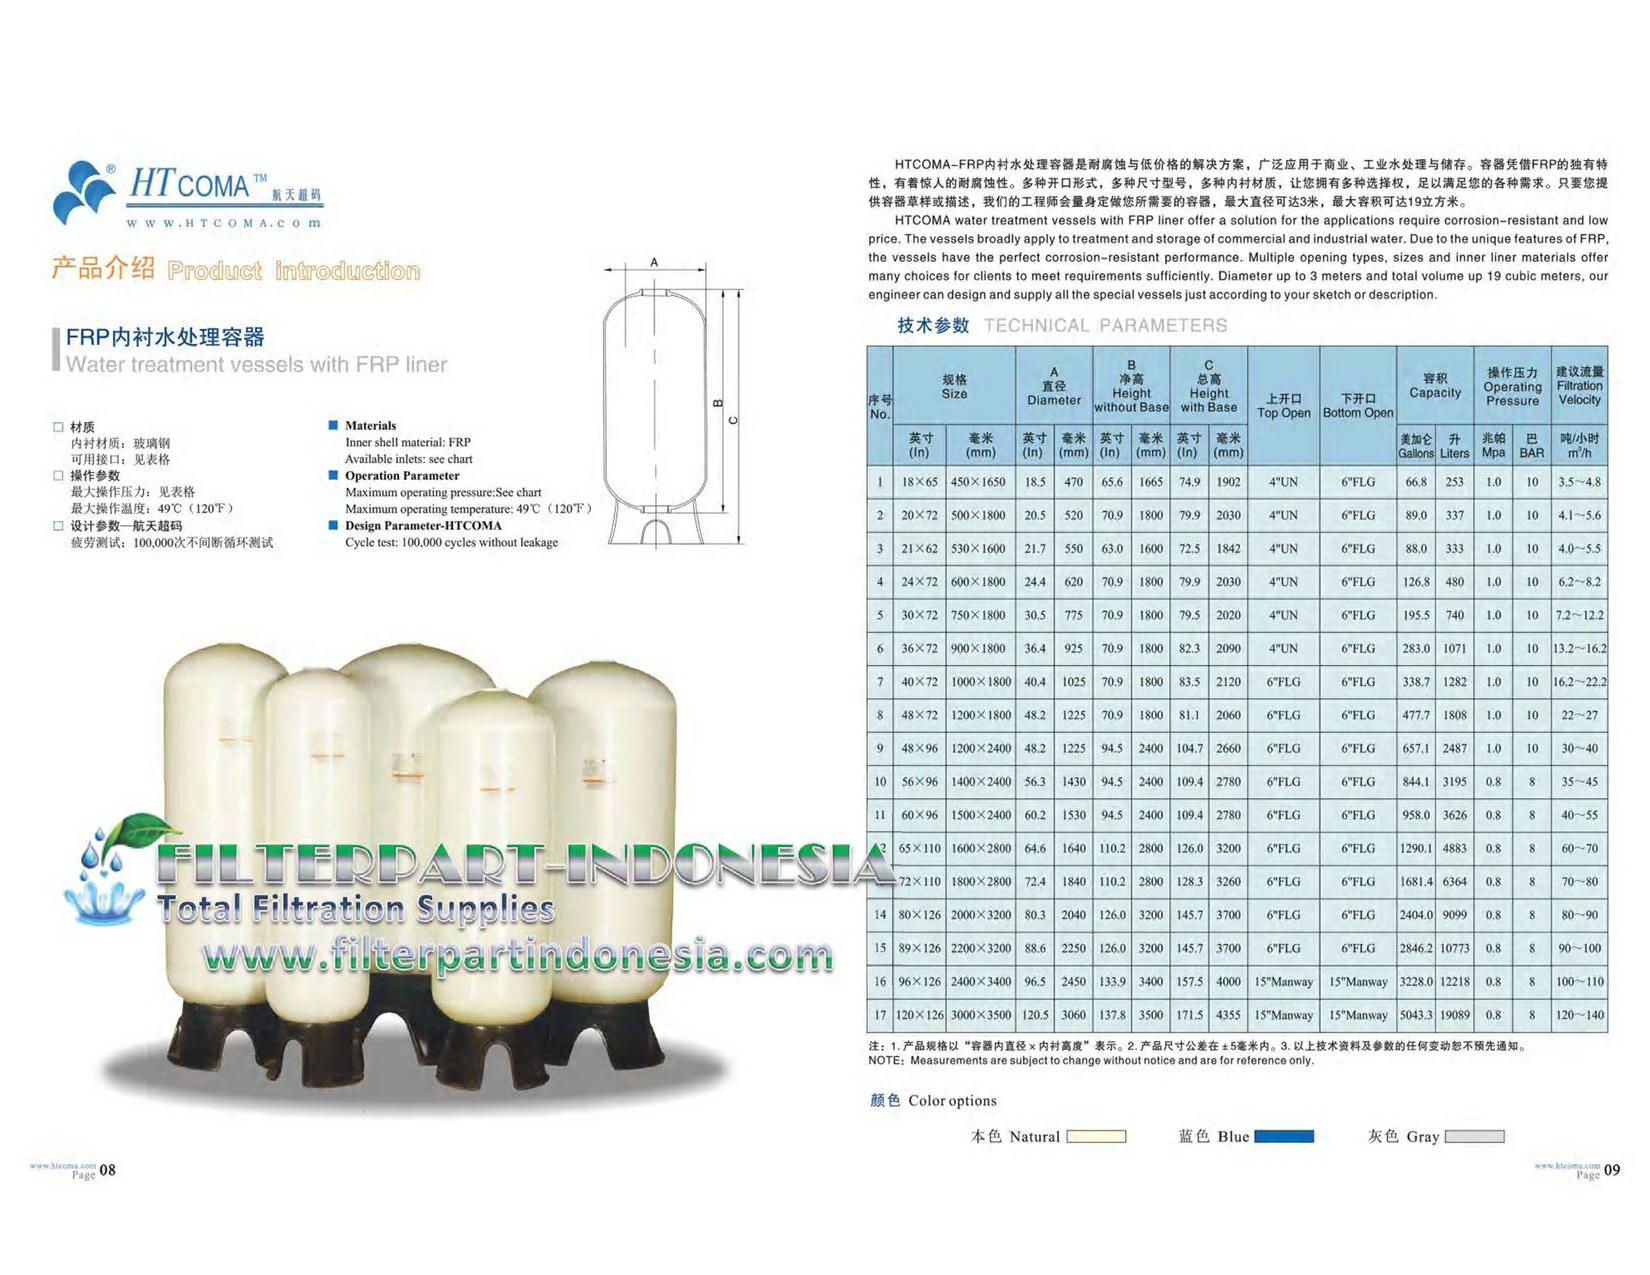 FRP Tank 3672 HTCOMA Tank Filter PT PROFILTER INDONESIA